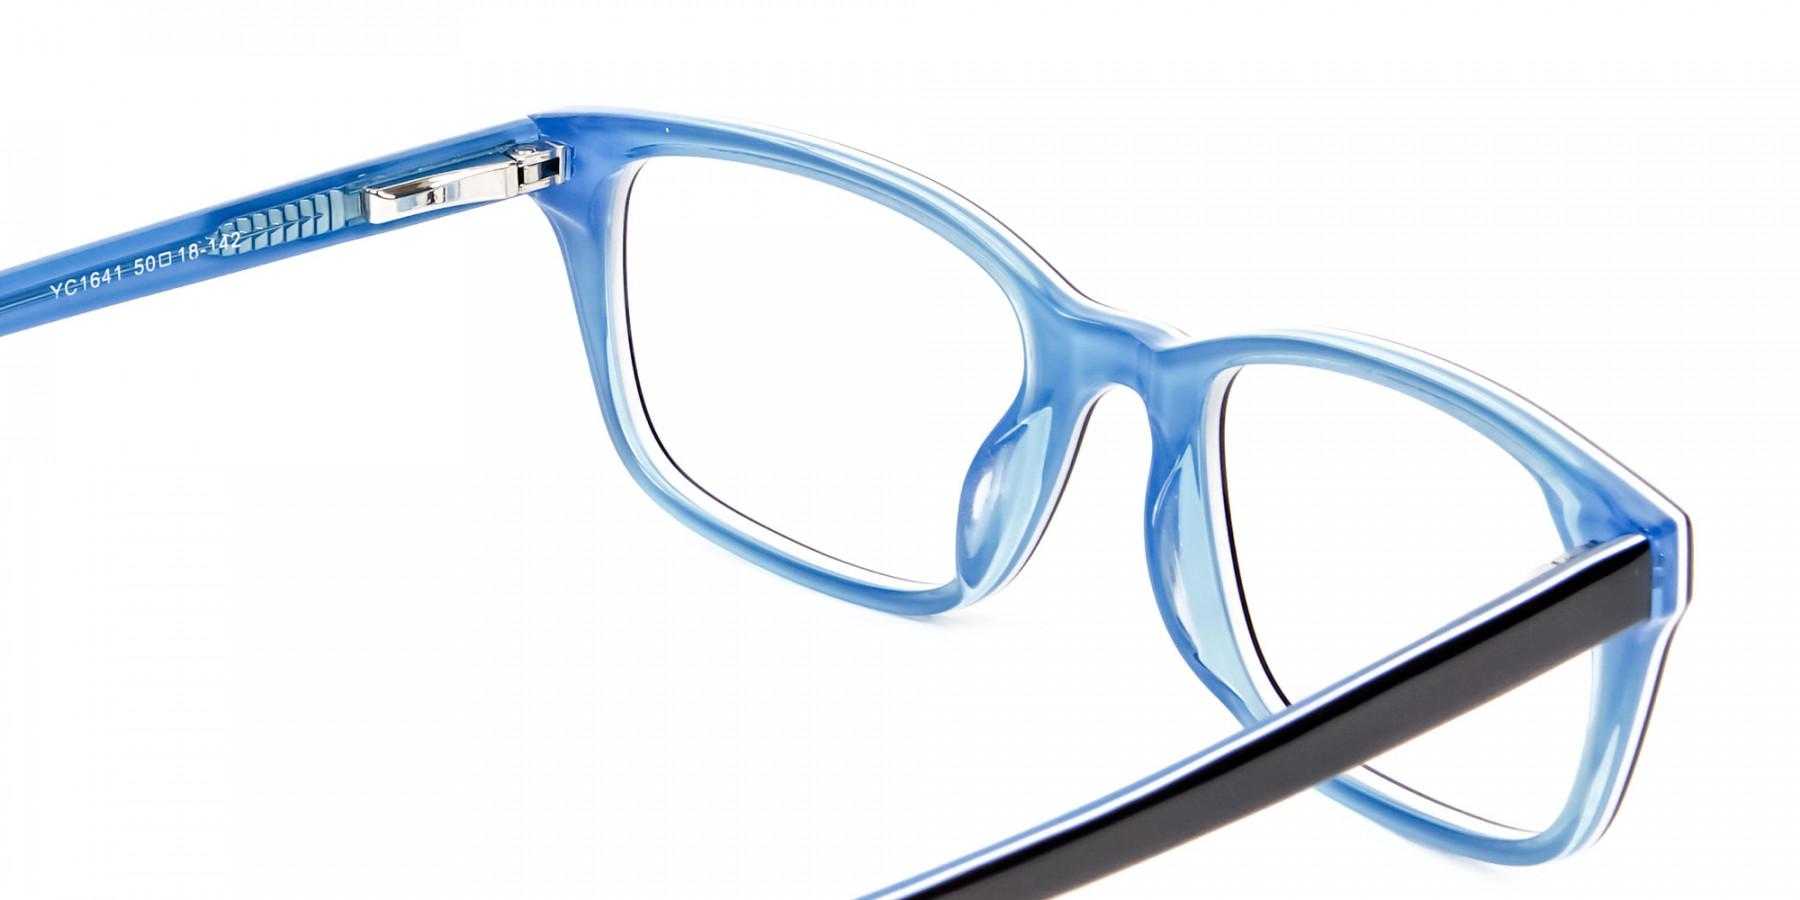 Striking Blue Eyeglass Frames -1